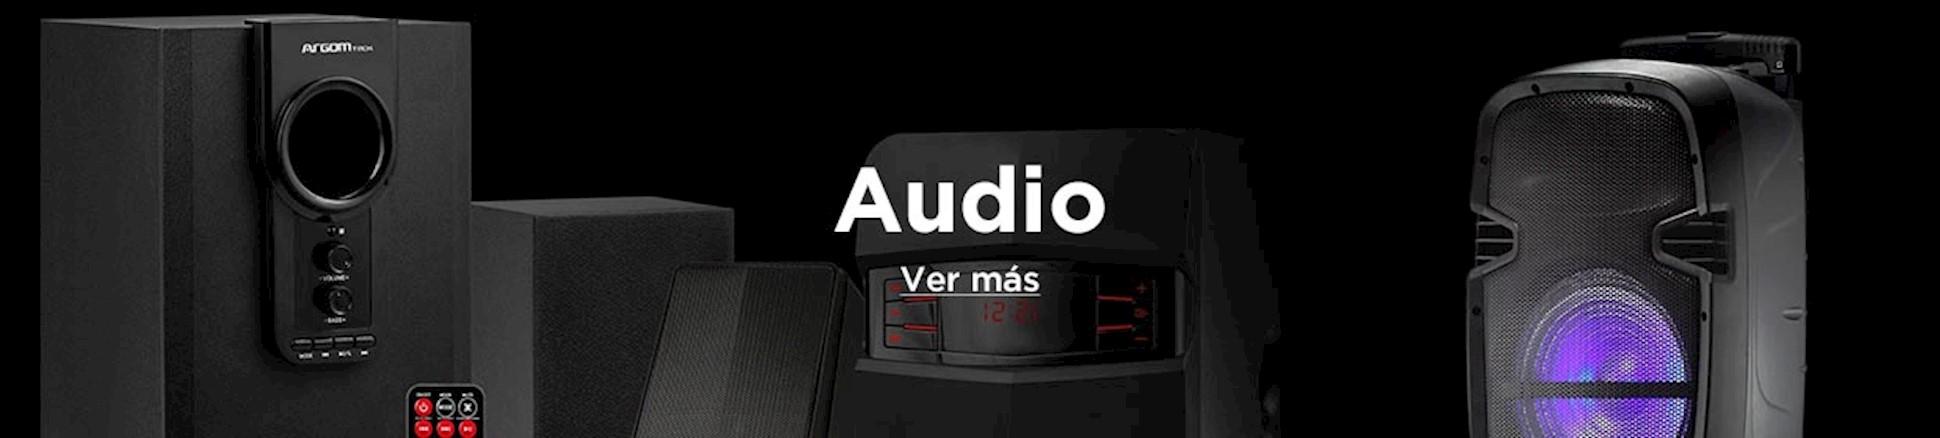 1240x280-audio.jpg